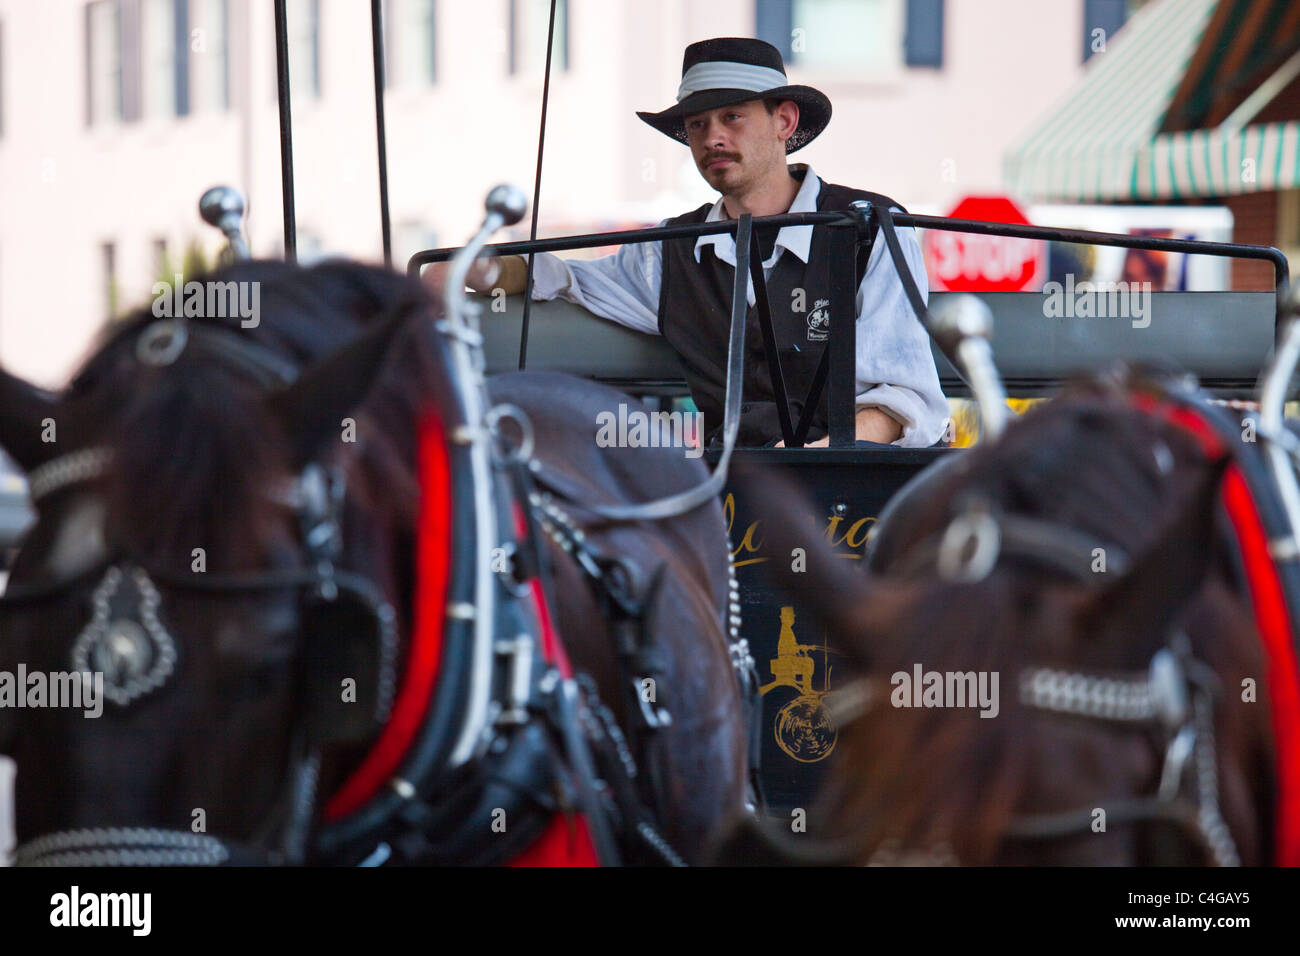 Horse Carriage in Savannah Georgia - Stock Image